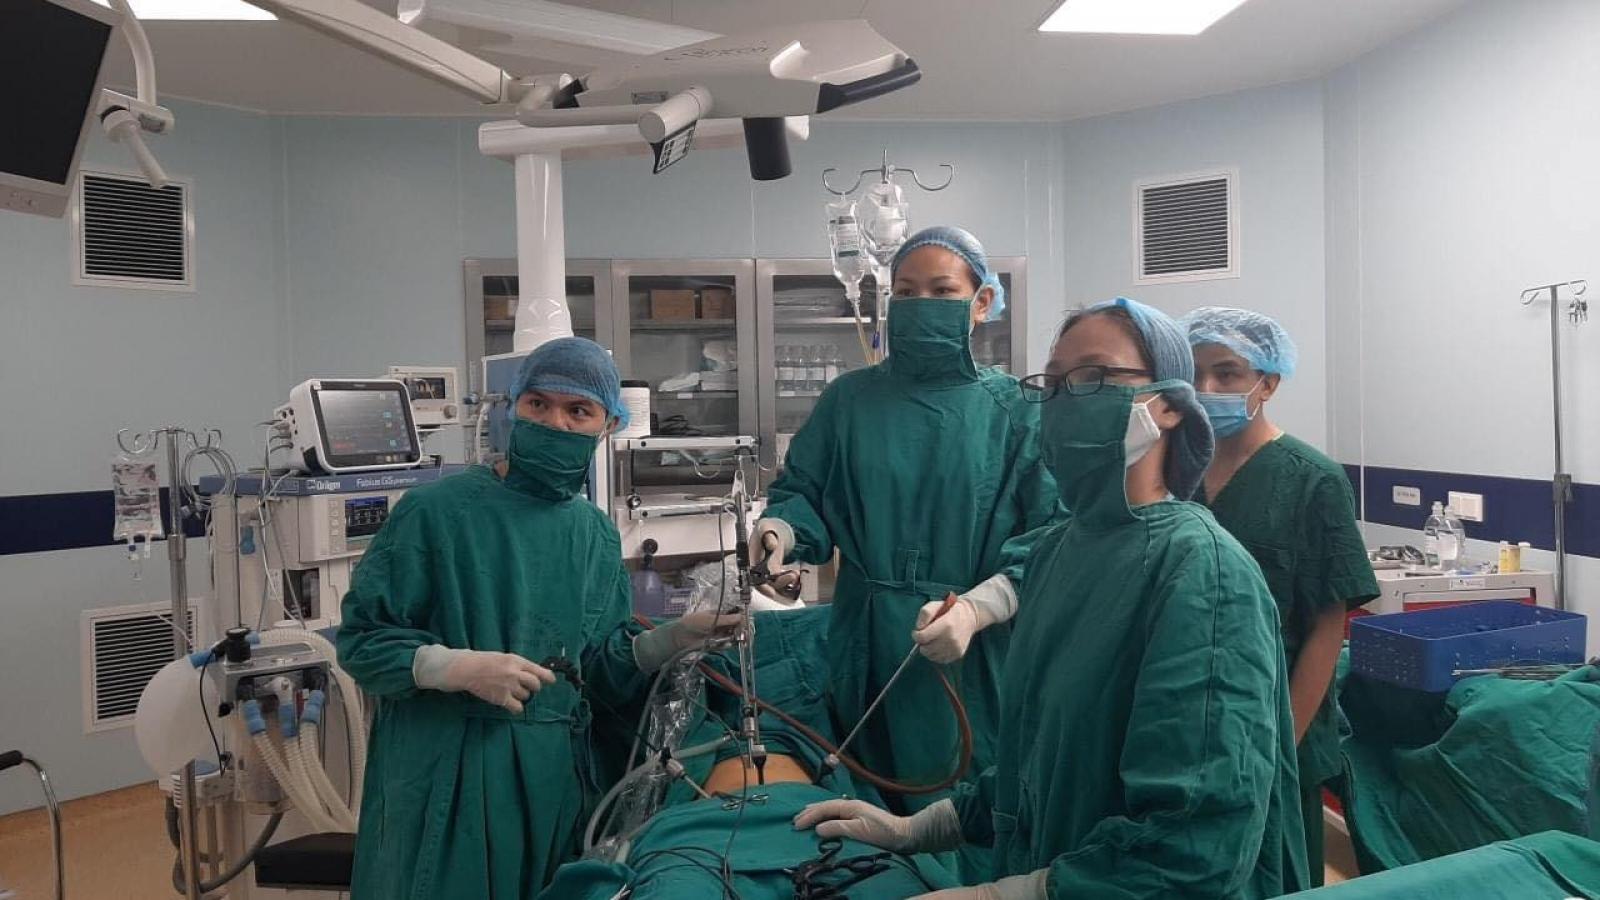 Phẫu thuật kịp thời cứu thai phụ chửa kẽ tử cung cực hiếm